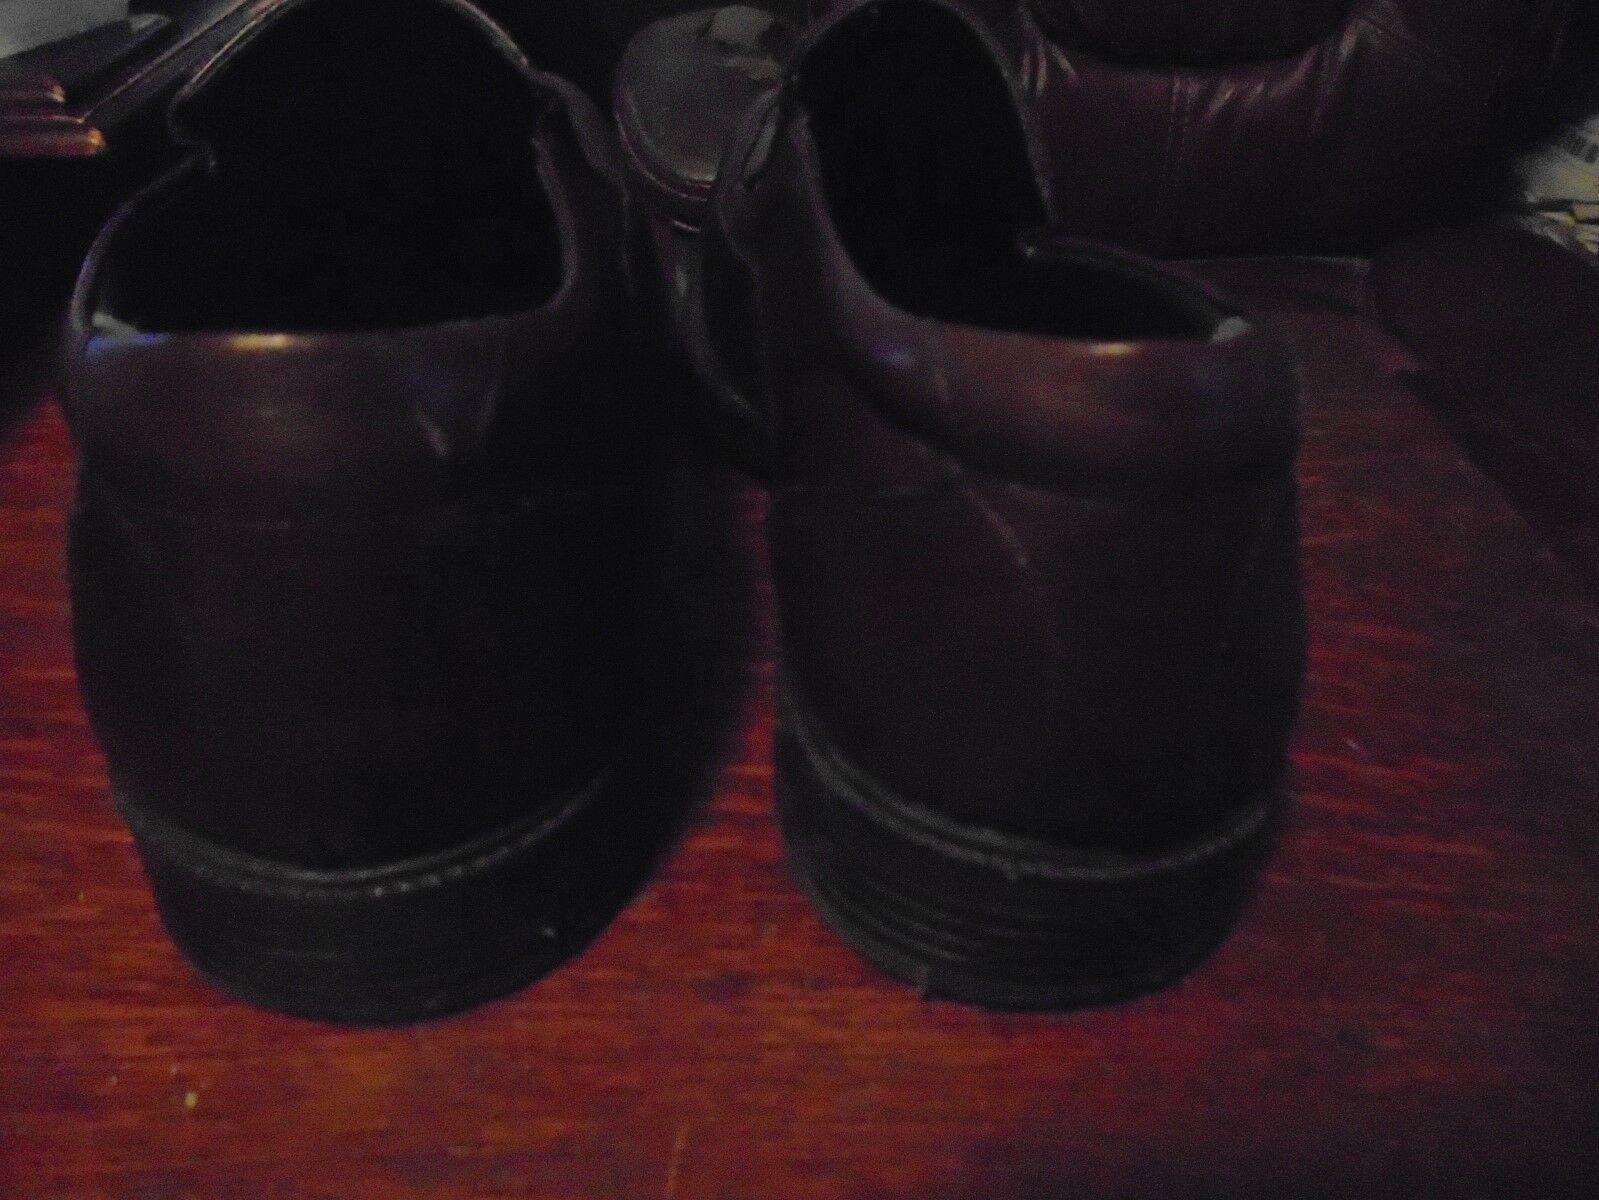 Johnston Murphy Mens braun Slip-On Slip-On Slip-On Casual Dress schuhe Größe 9 1 2 M 68f34a